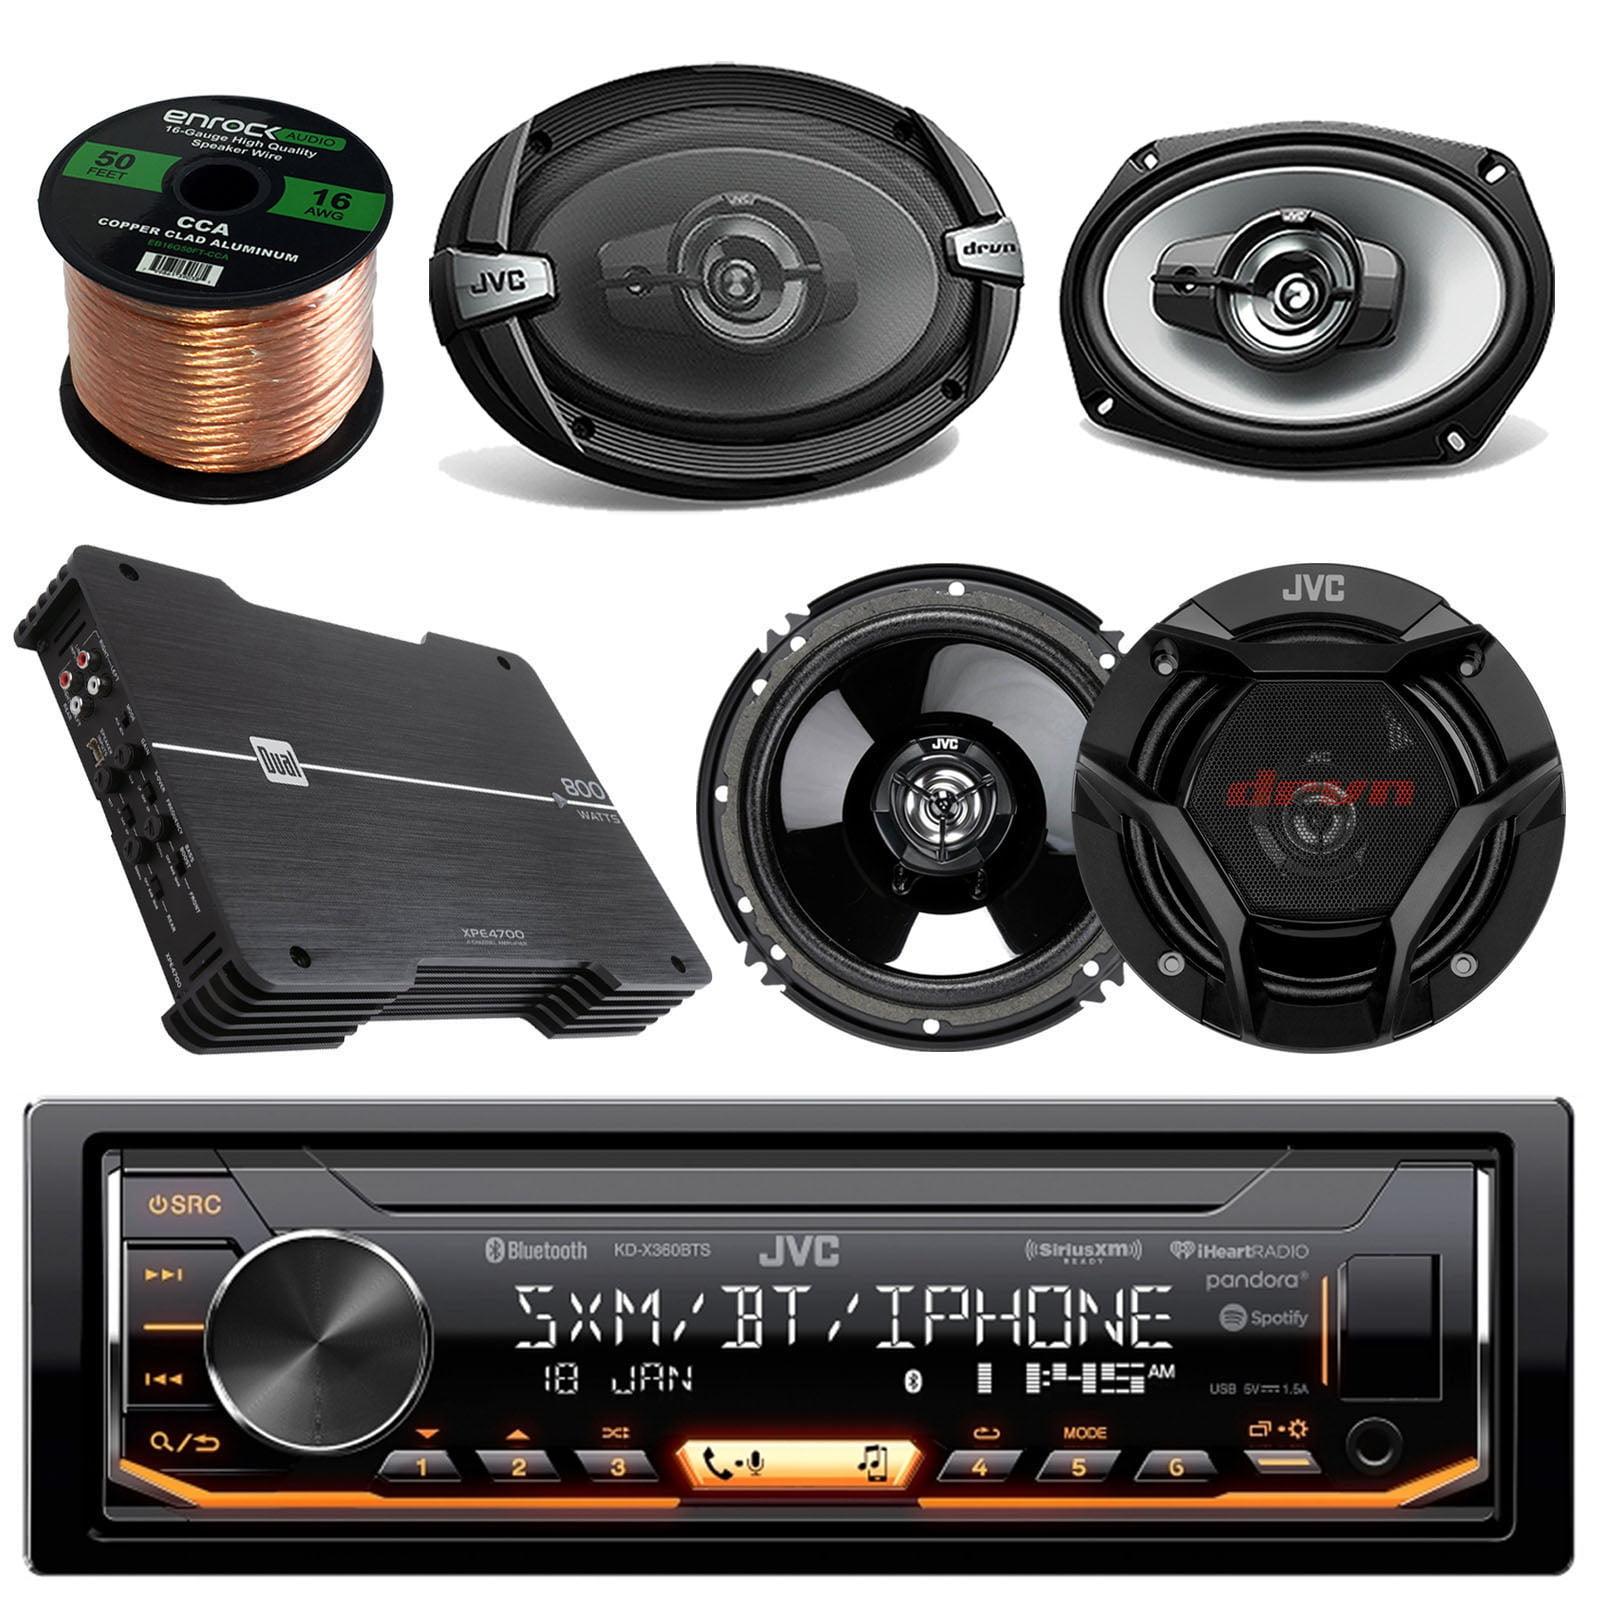 "JVC KD-X360BTS AM/FM USB AUX Car Stereo Receiver Bundle Combo With 2x JVC CSDR6940 6x9"" 3-Way Vehicle Coaxial Speakers + 2x CSDR620 6.5"" Audio Speaker + Dual XPE4700 800w Amplifier + 50Ft 16g Wire"